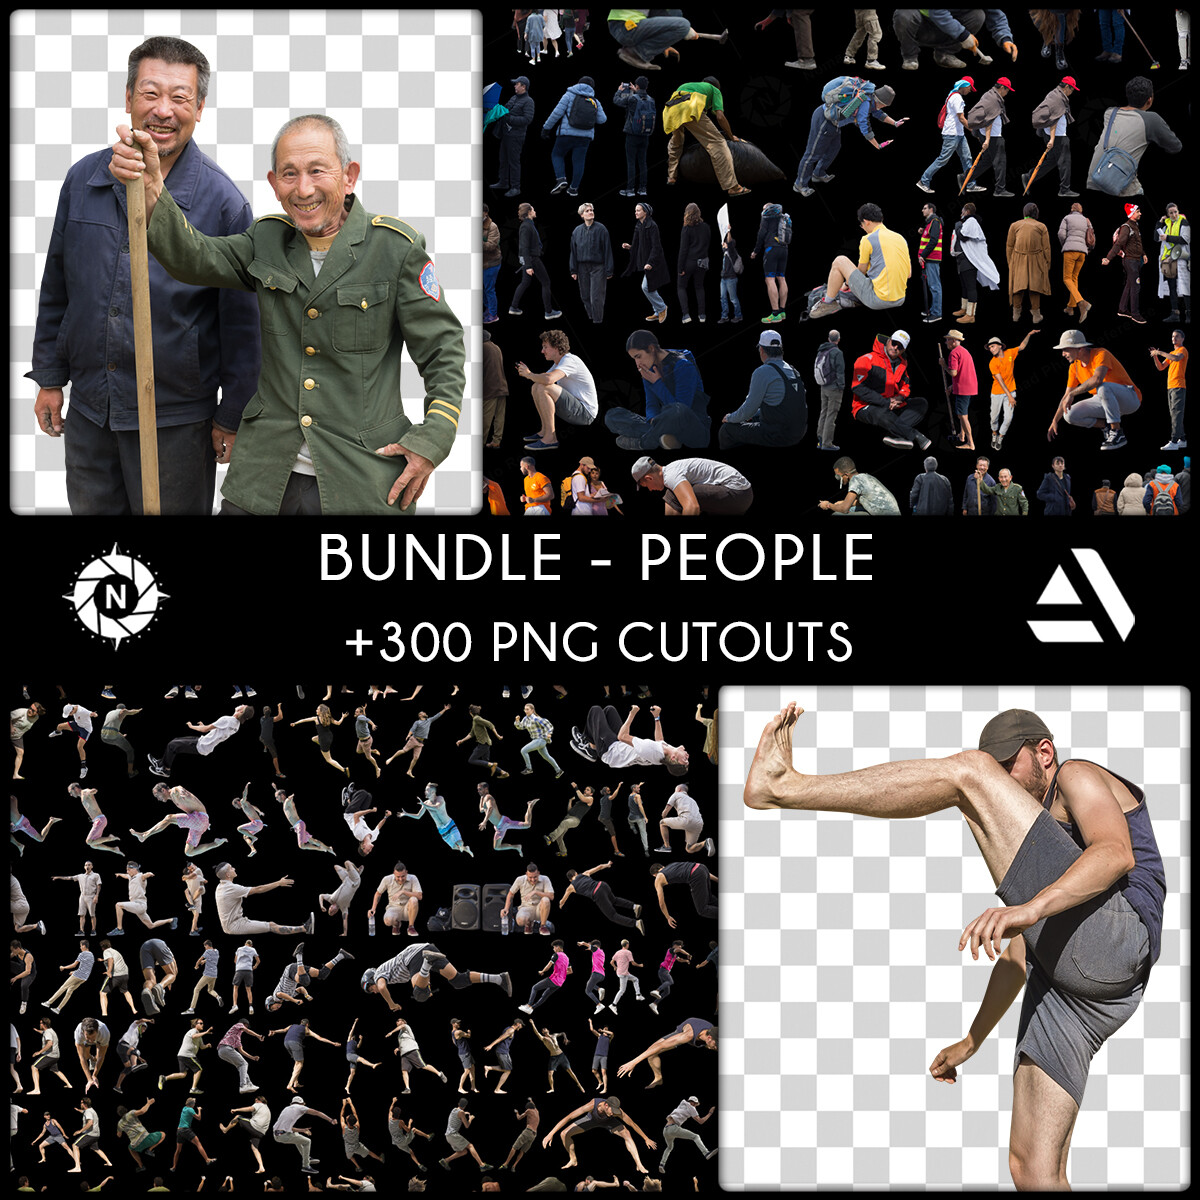 Bundle: PNG Cutouts - People - Company License  https://www.artstation.com/a/5465292